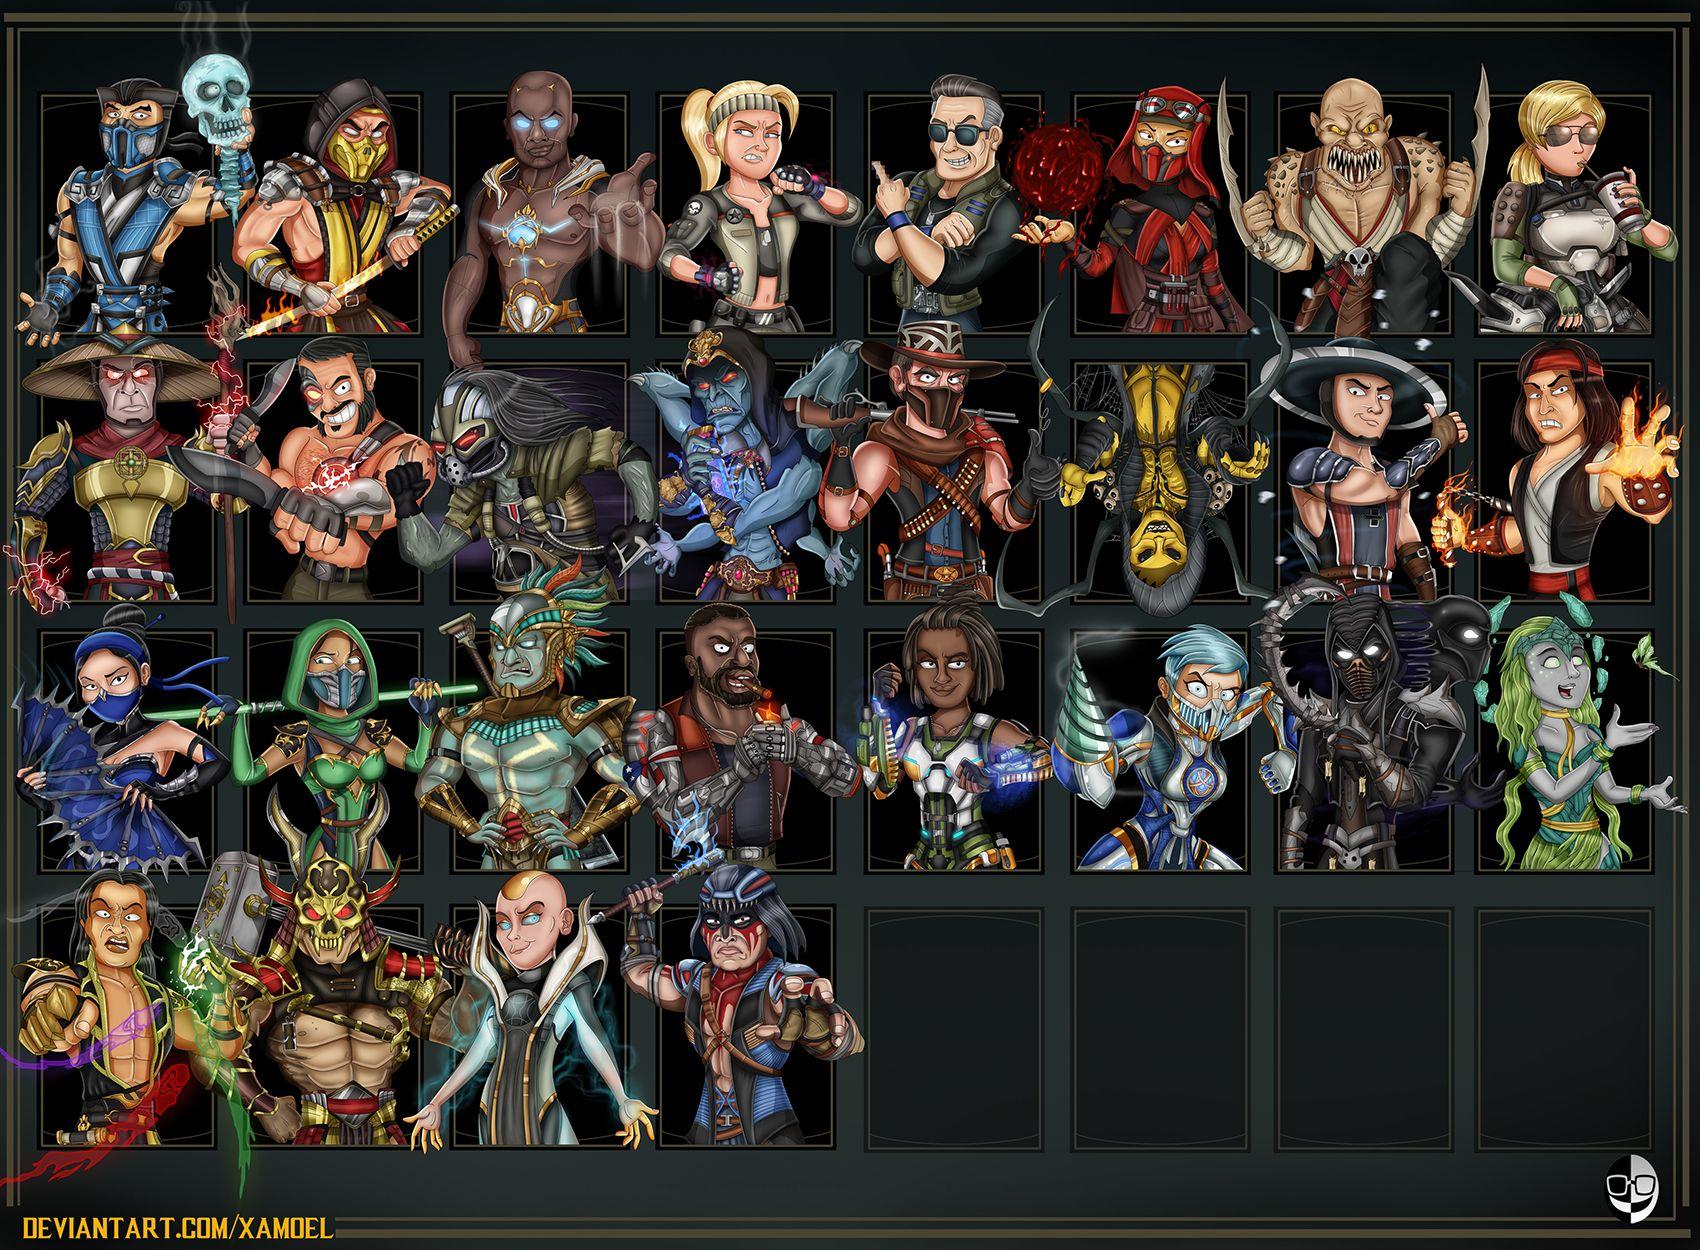 Mortal Kombat 11 By Xamoel On Deviantart In 2020 Mortal Kombat